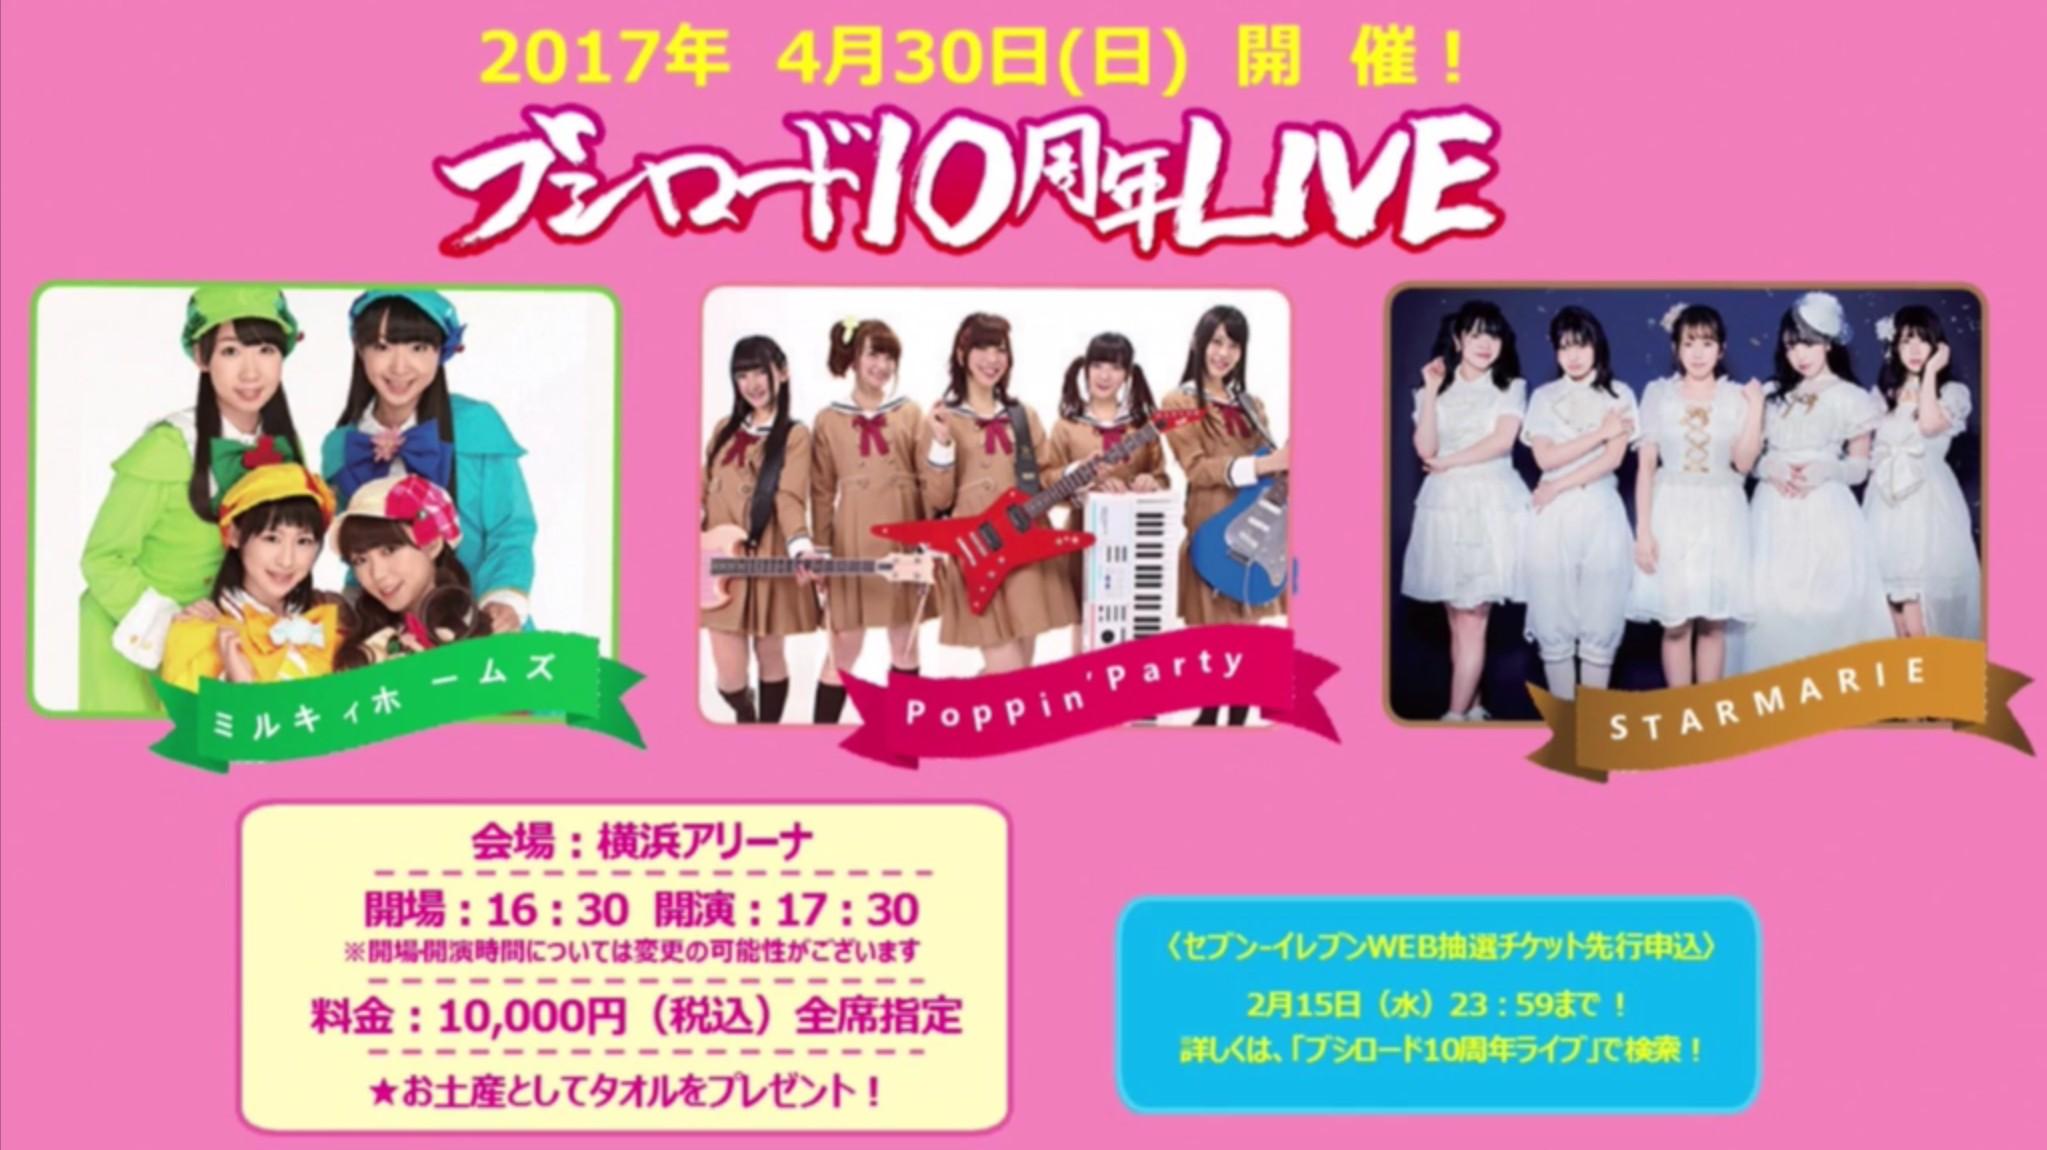 bshi-live-170130-mntr-000.jpg